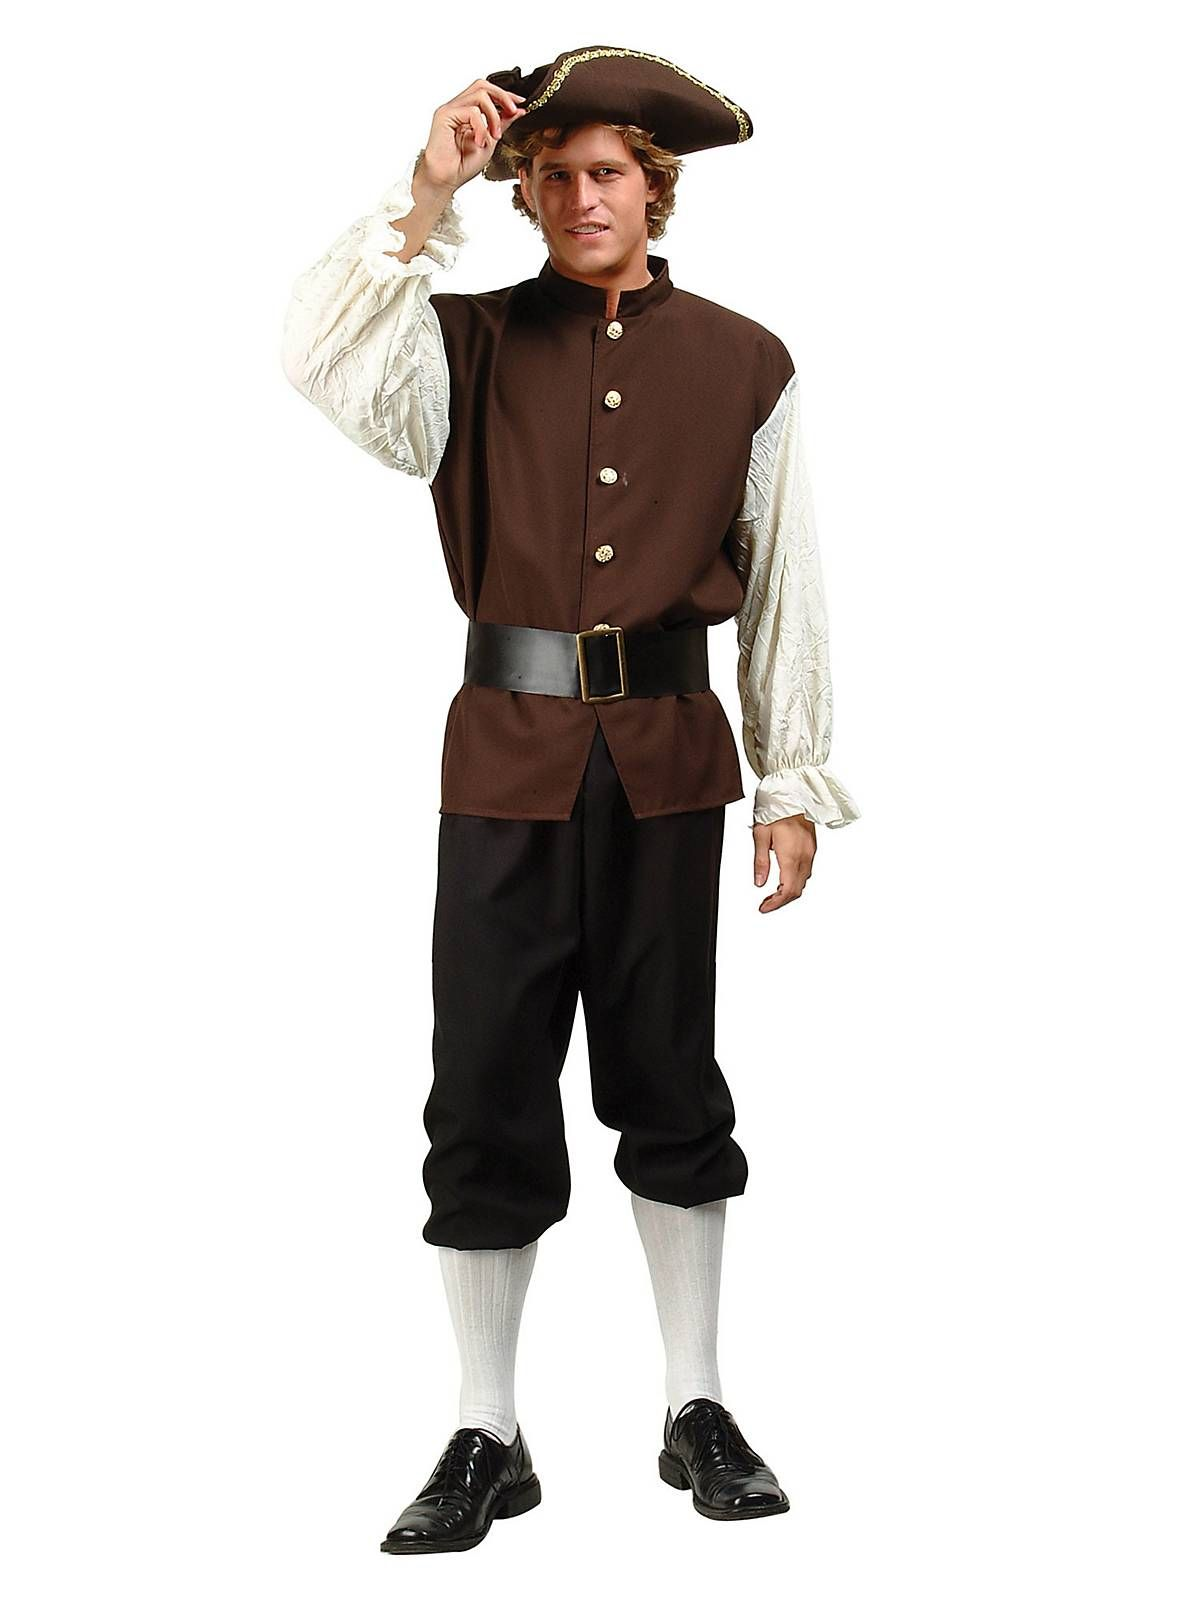 e947f5b3953 Mens Colonial / Pilgrim Peasant Costume | Cheap Historical Costumes for Men